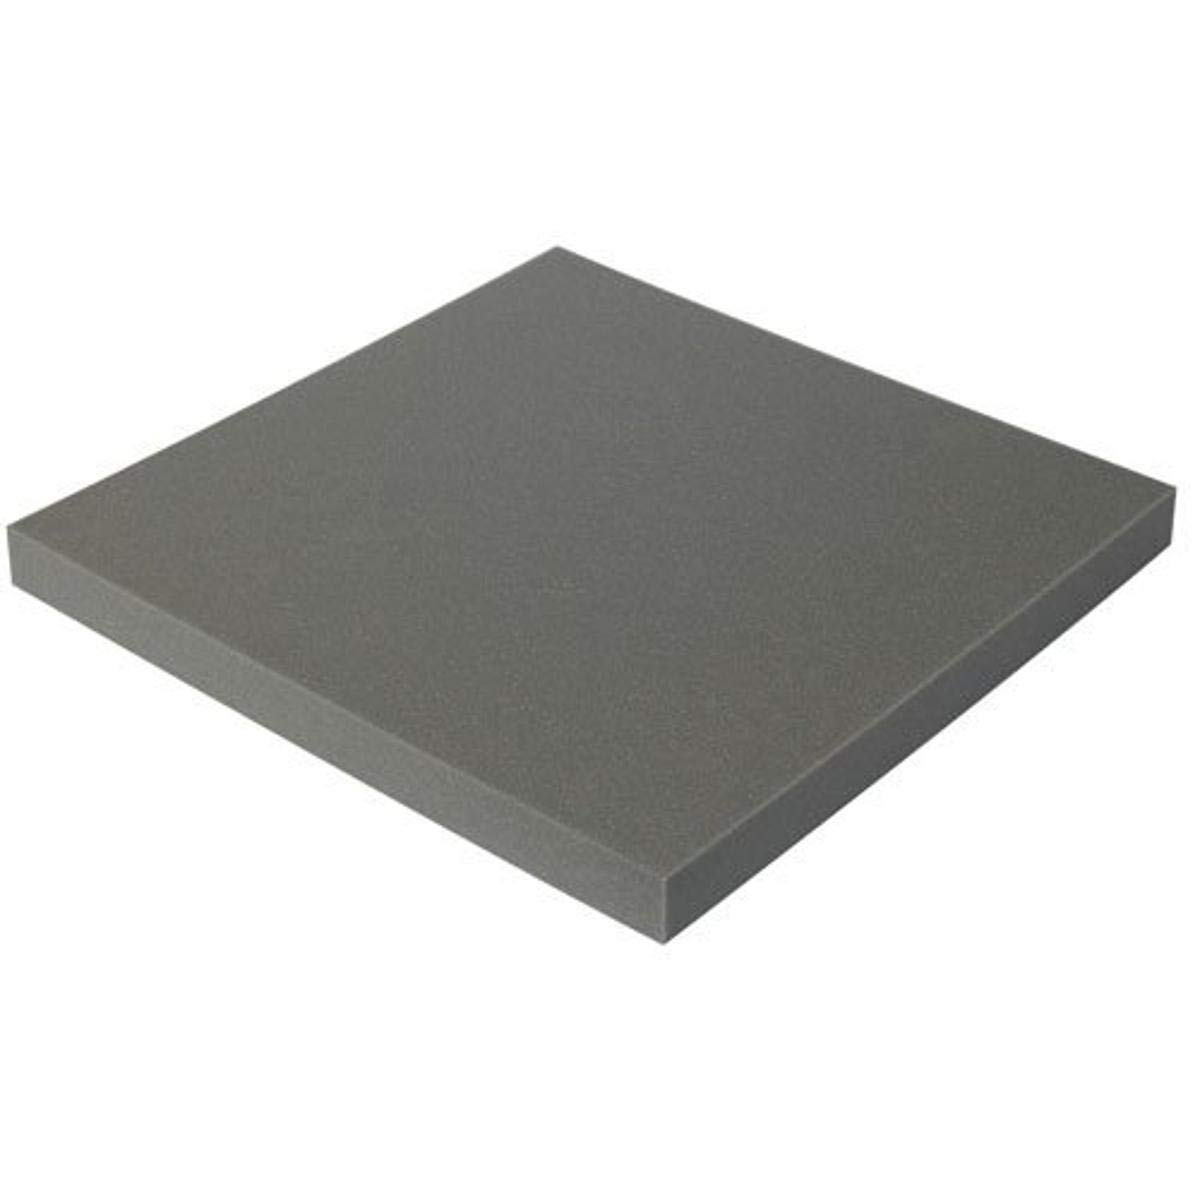 BOX USA BFSC121205 Soft Foam Sheets Discount mail order 12